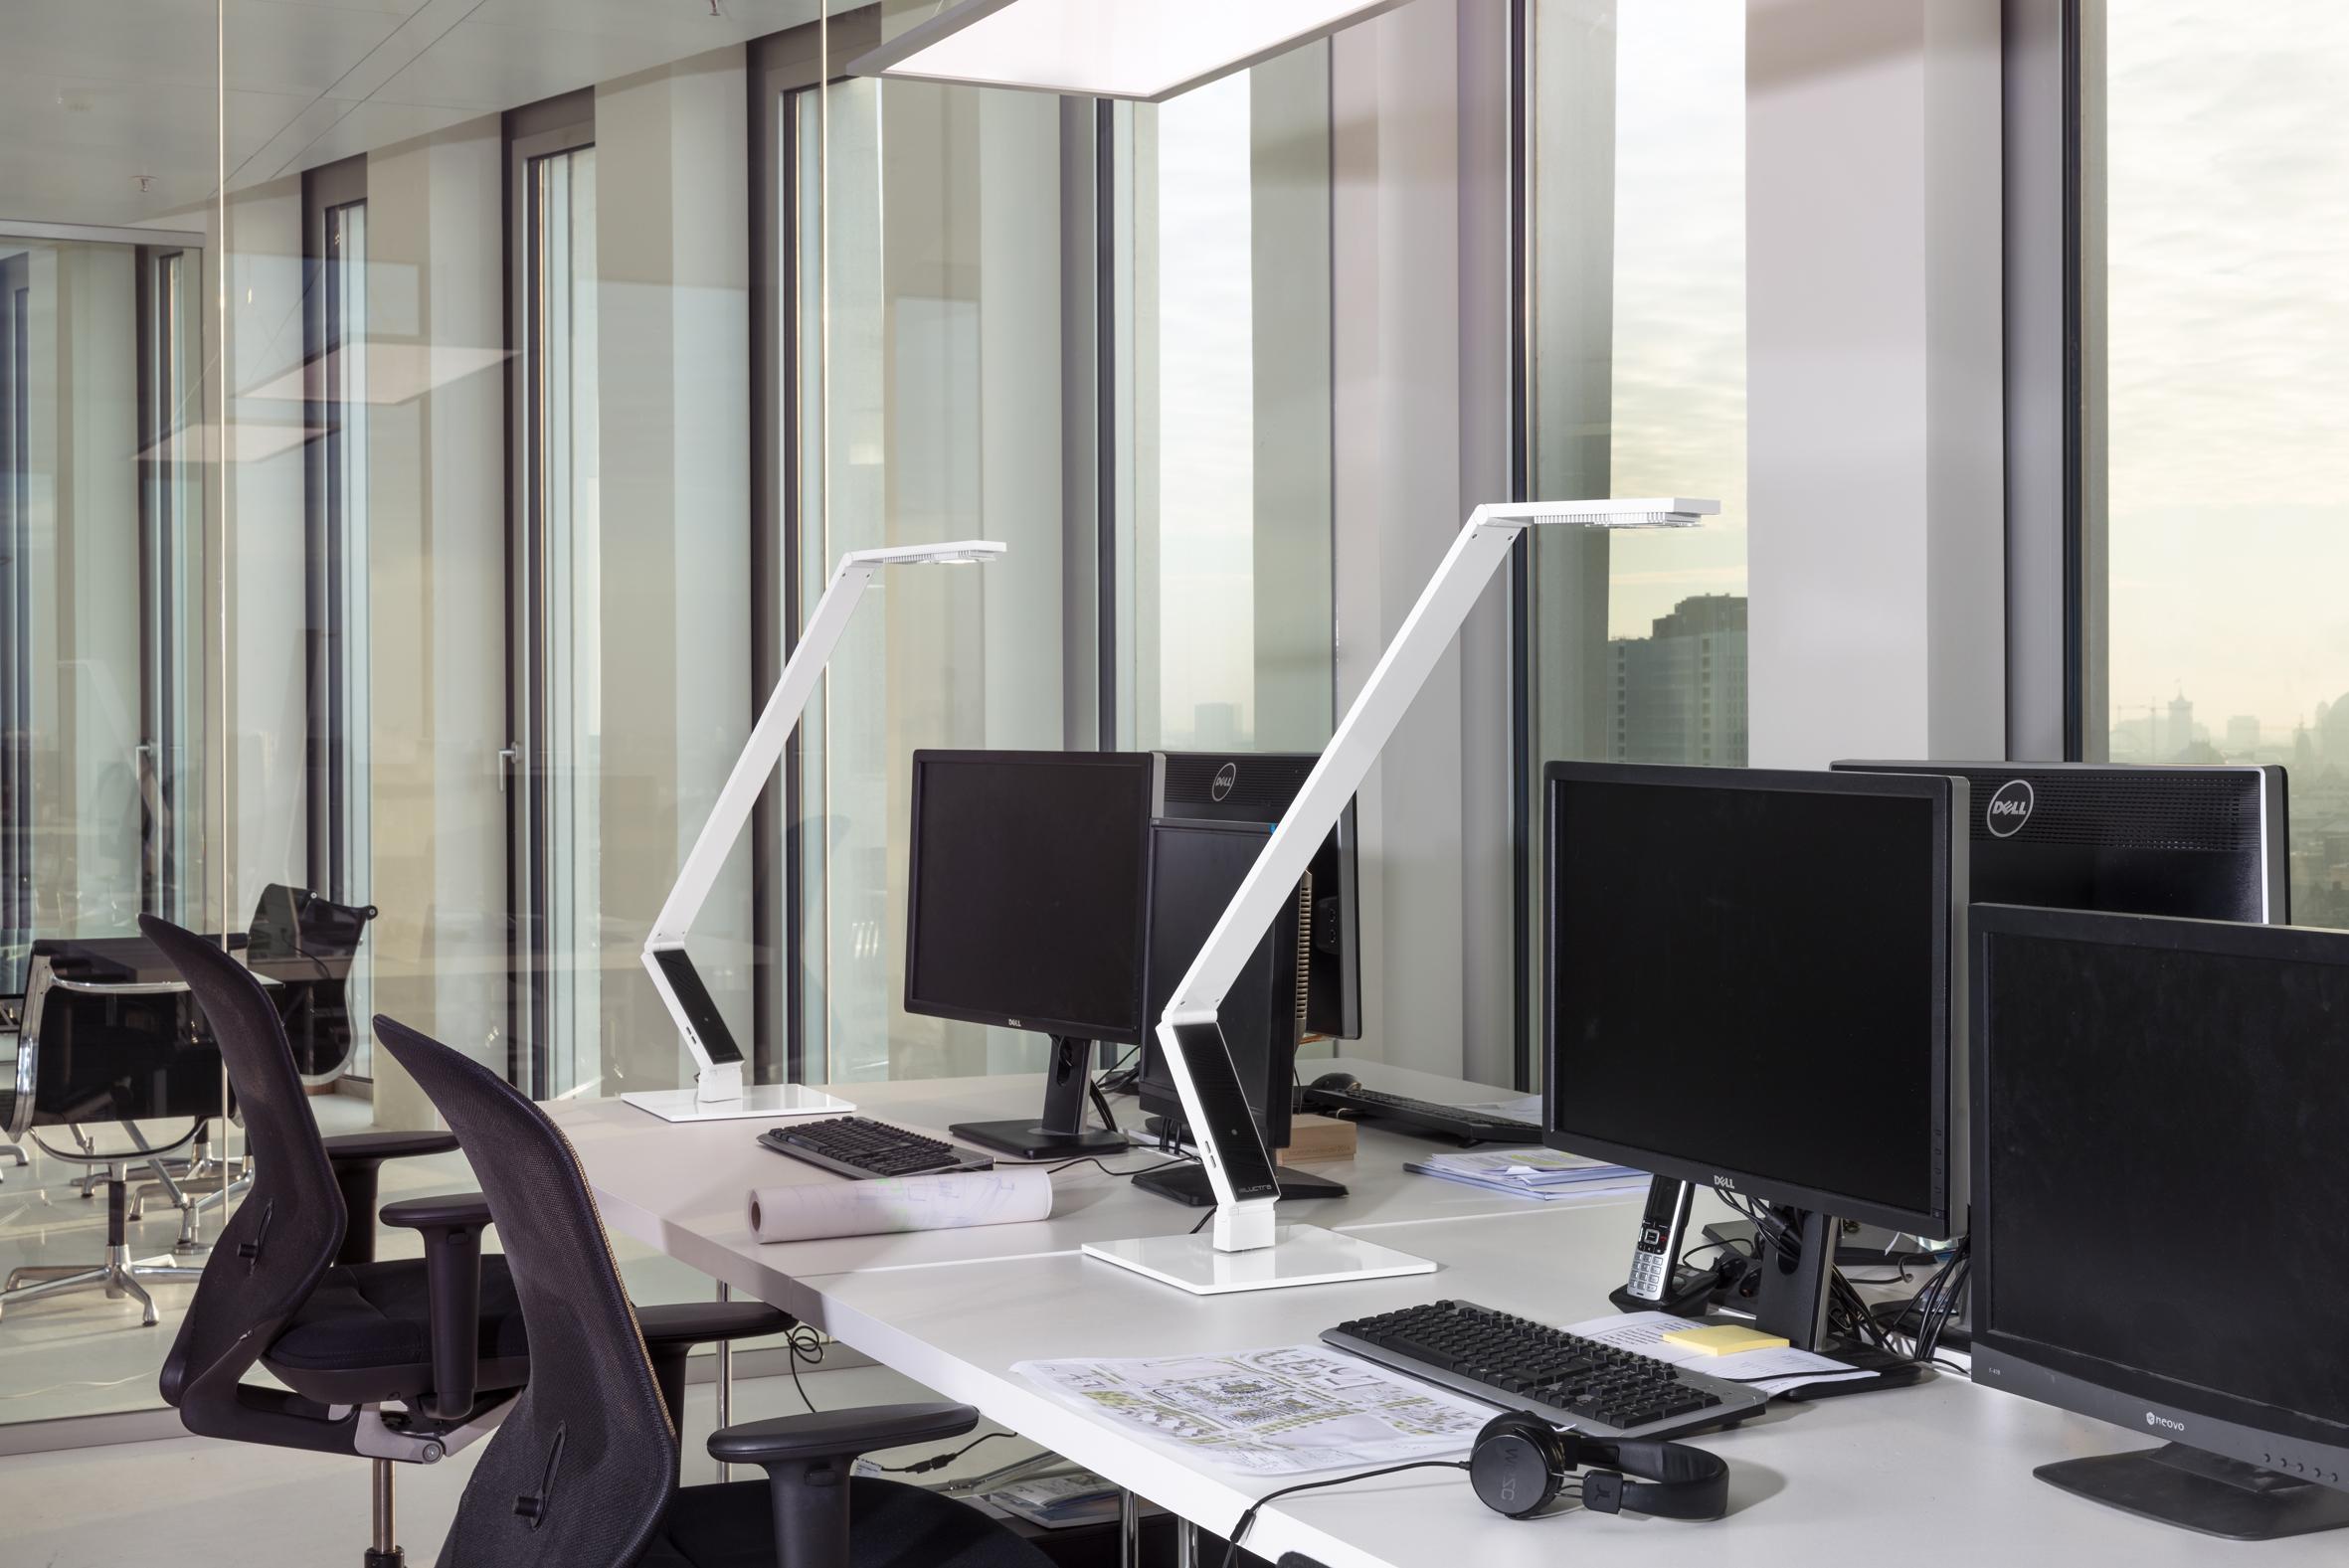 Studio Ufficio Differenza : Berlino atelier eike becker architekten. luce per lufficio ideale